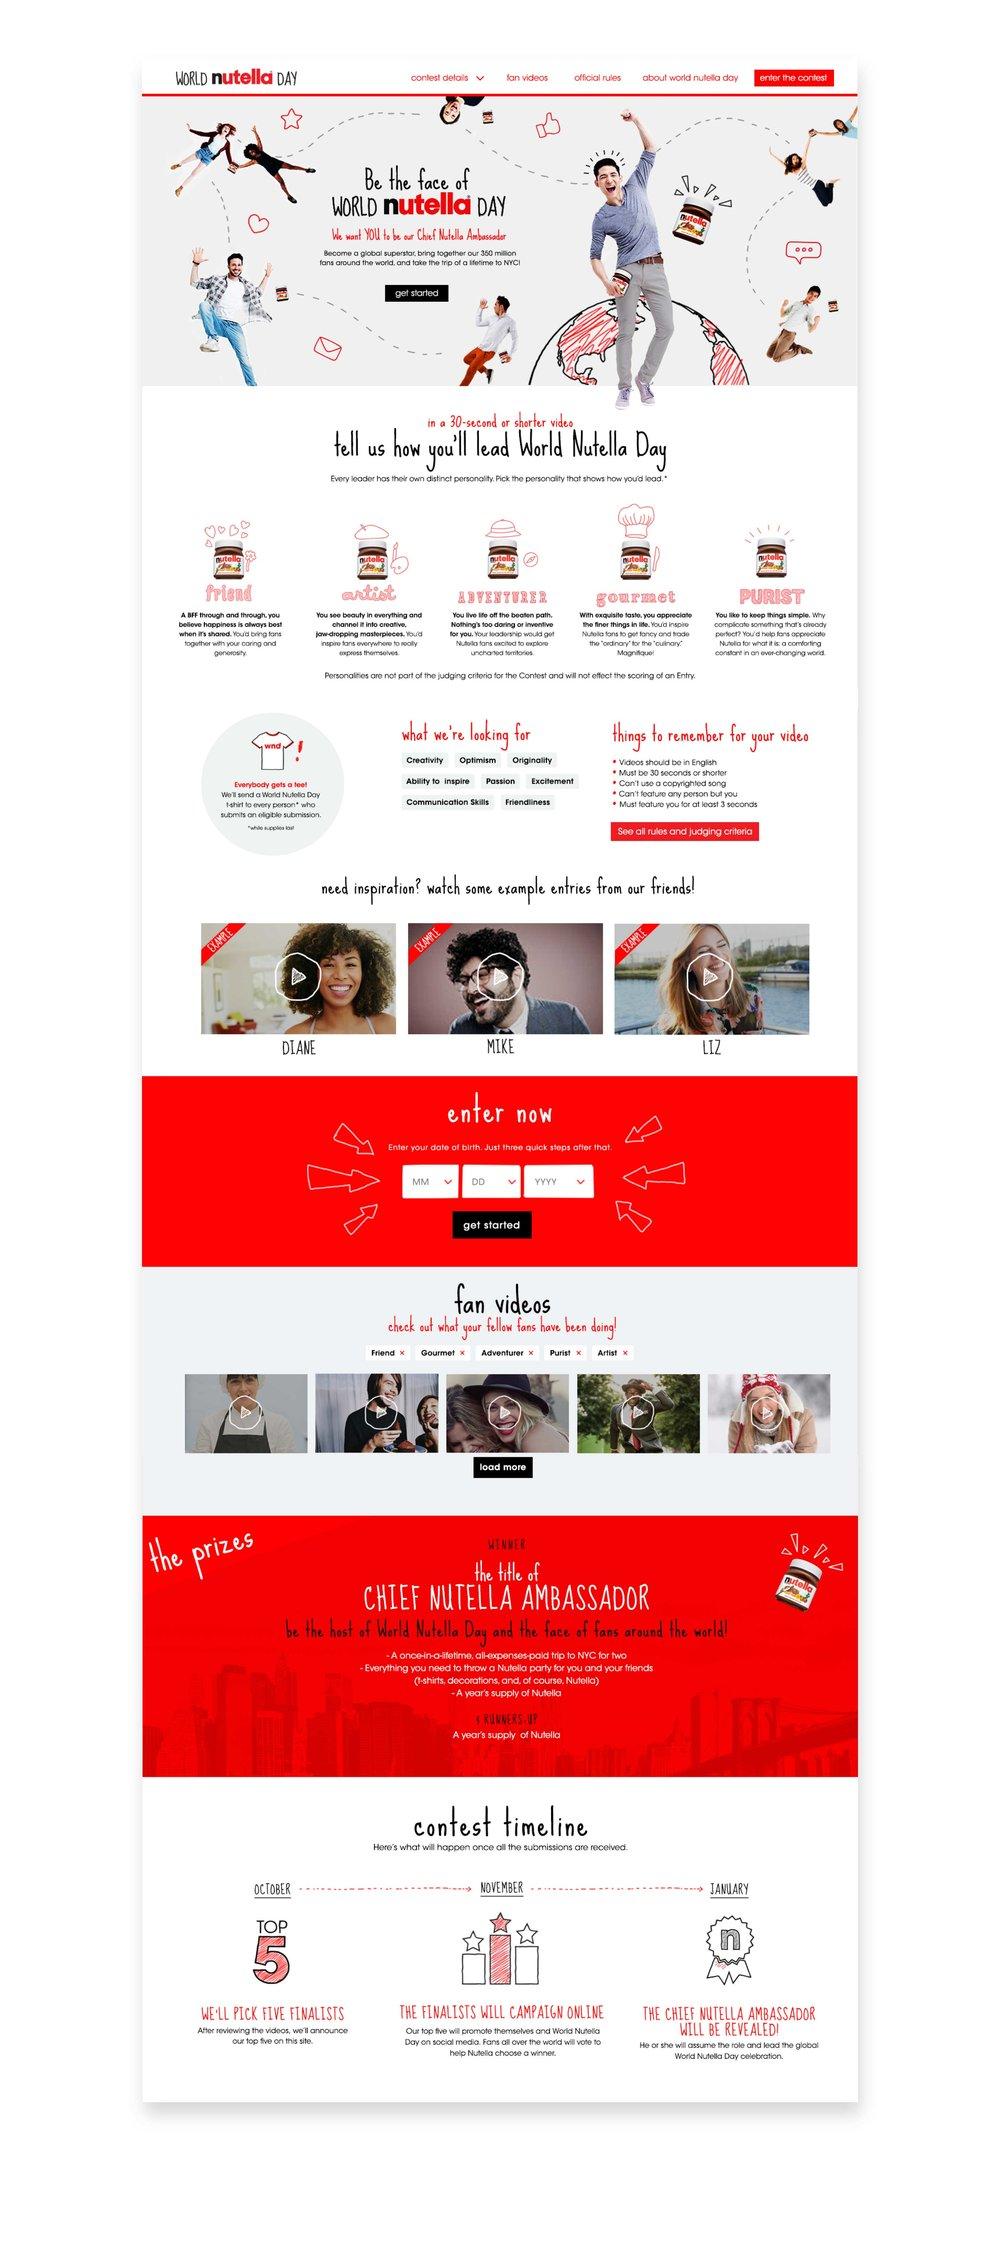 web_image_WND_2.jpg